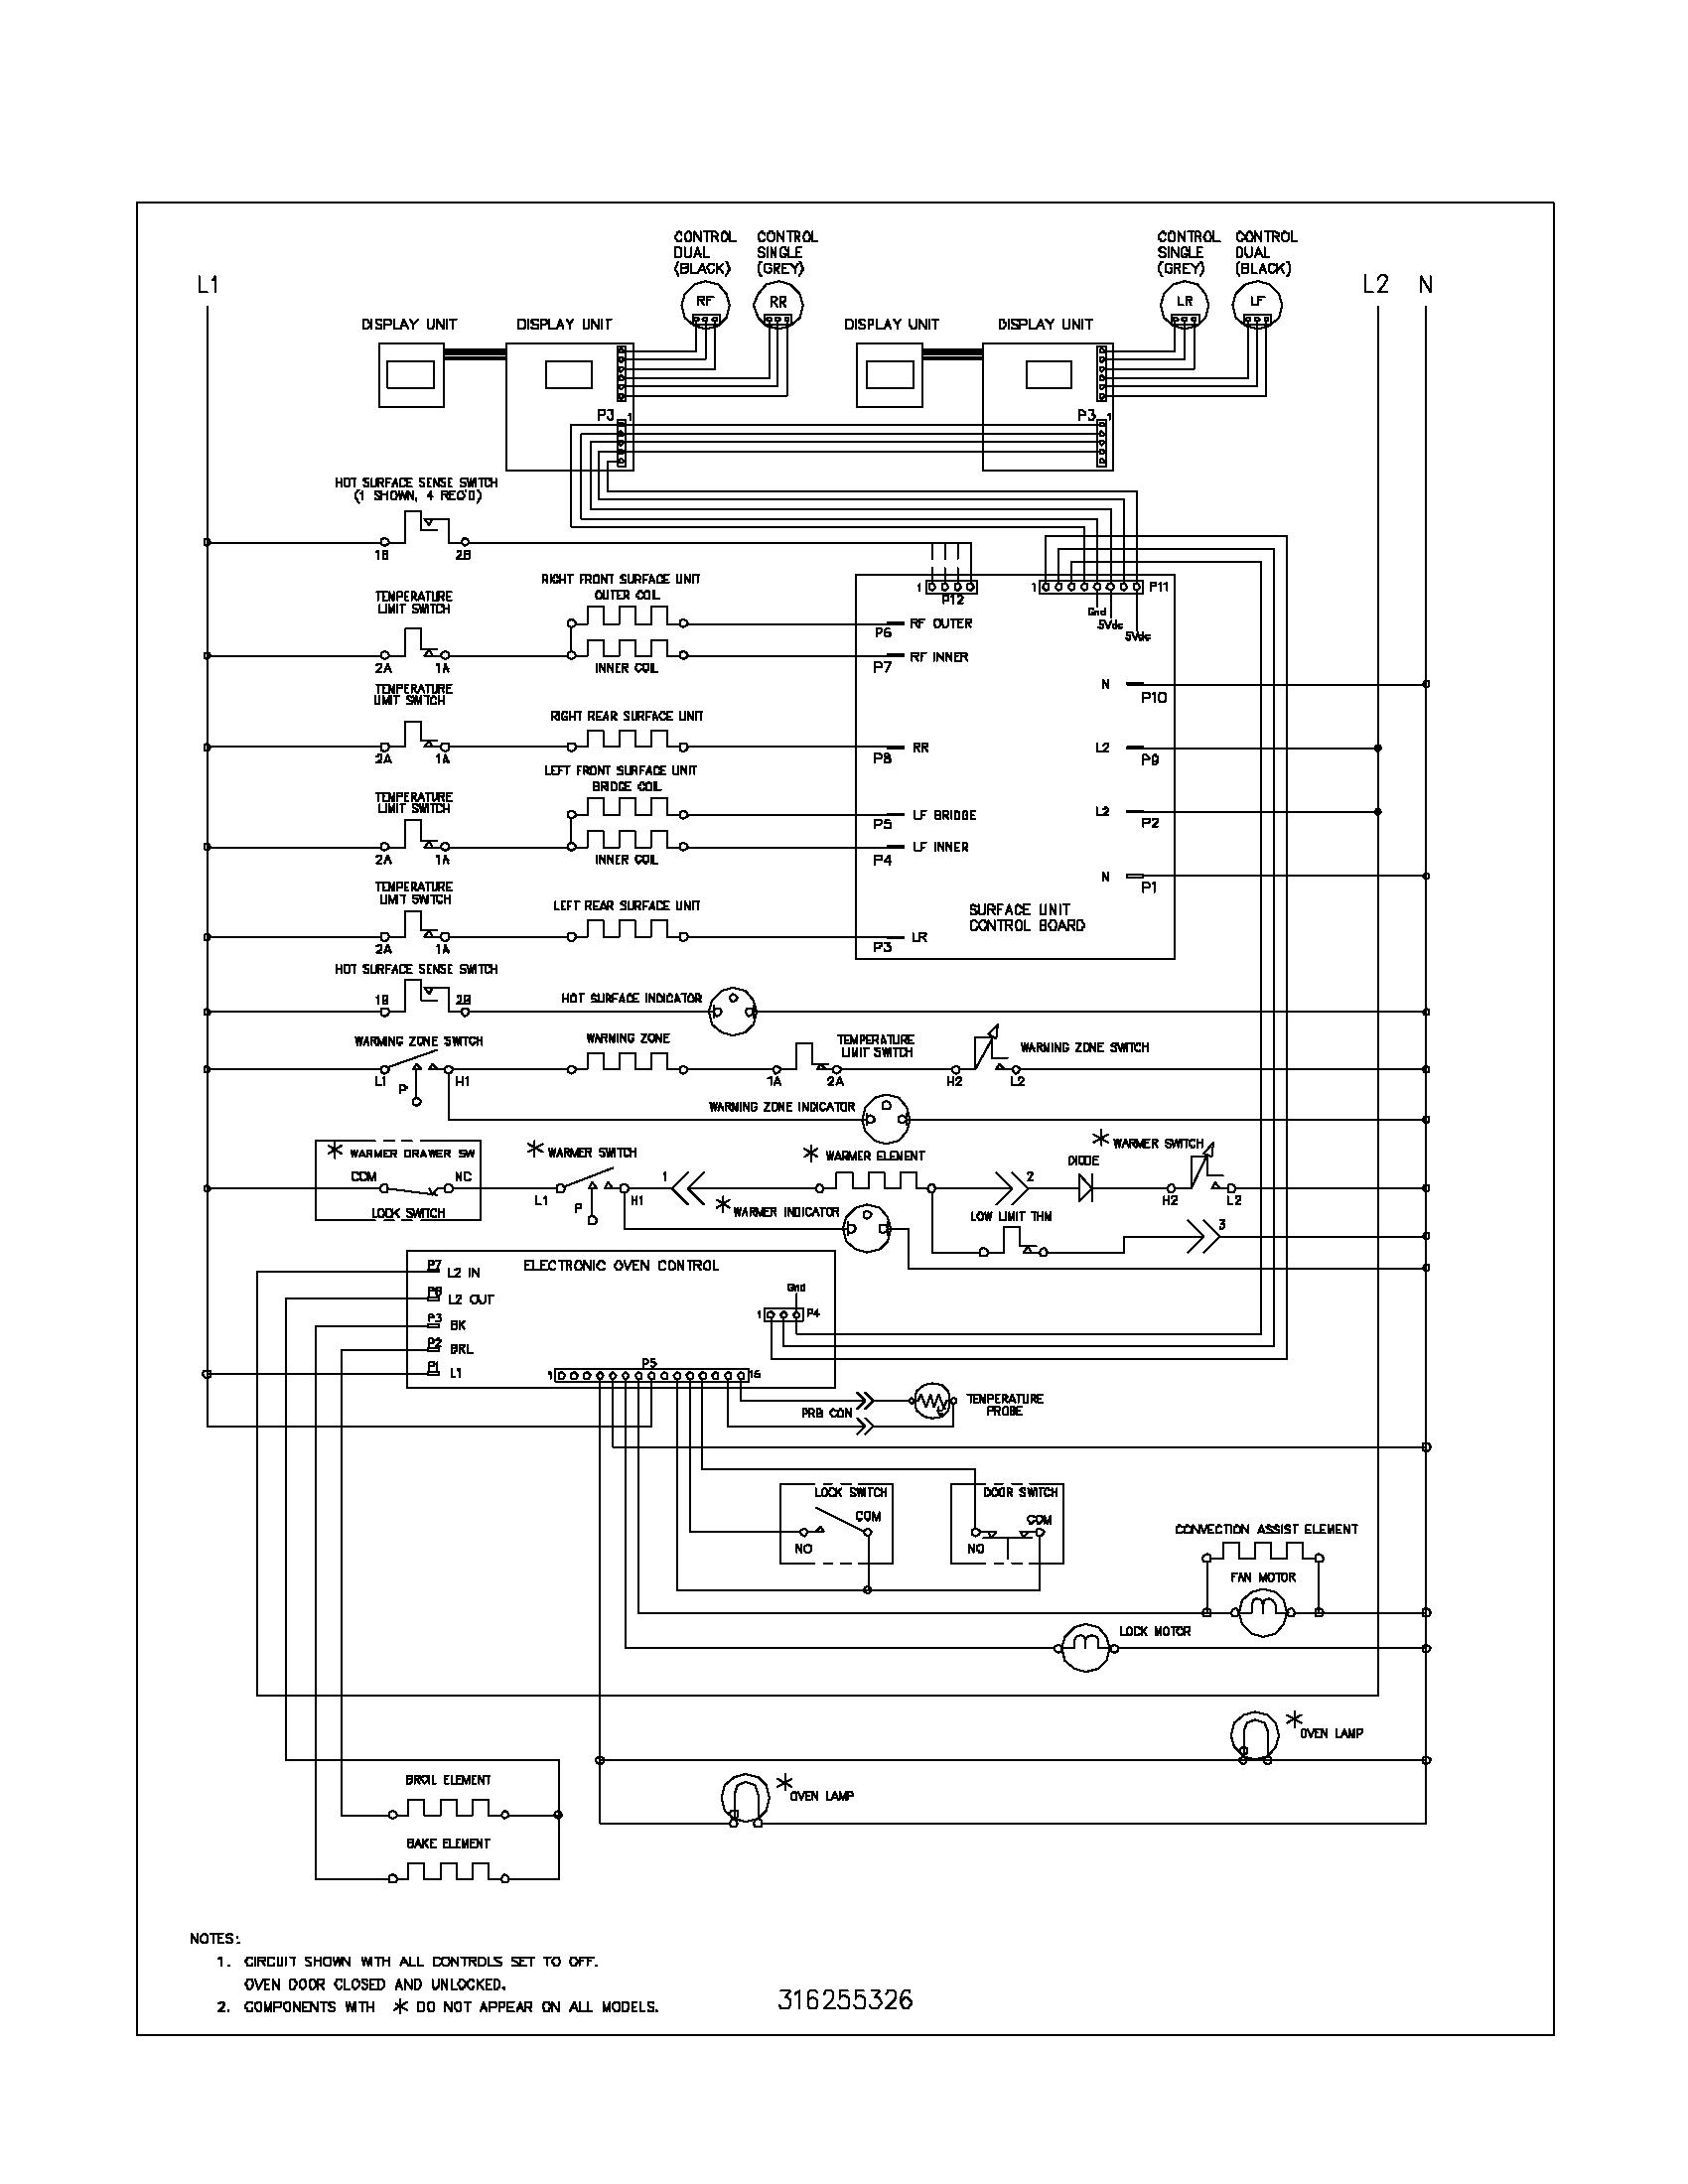 wiring diagram older furnace rh 2646  williams furnace wiring diagram get free image about  furnace wiring diagram get free image